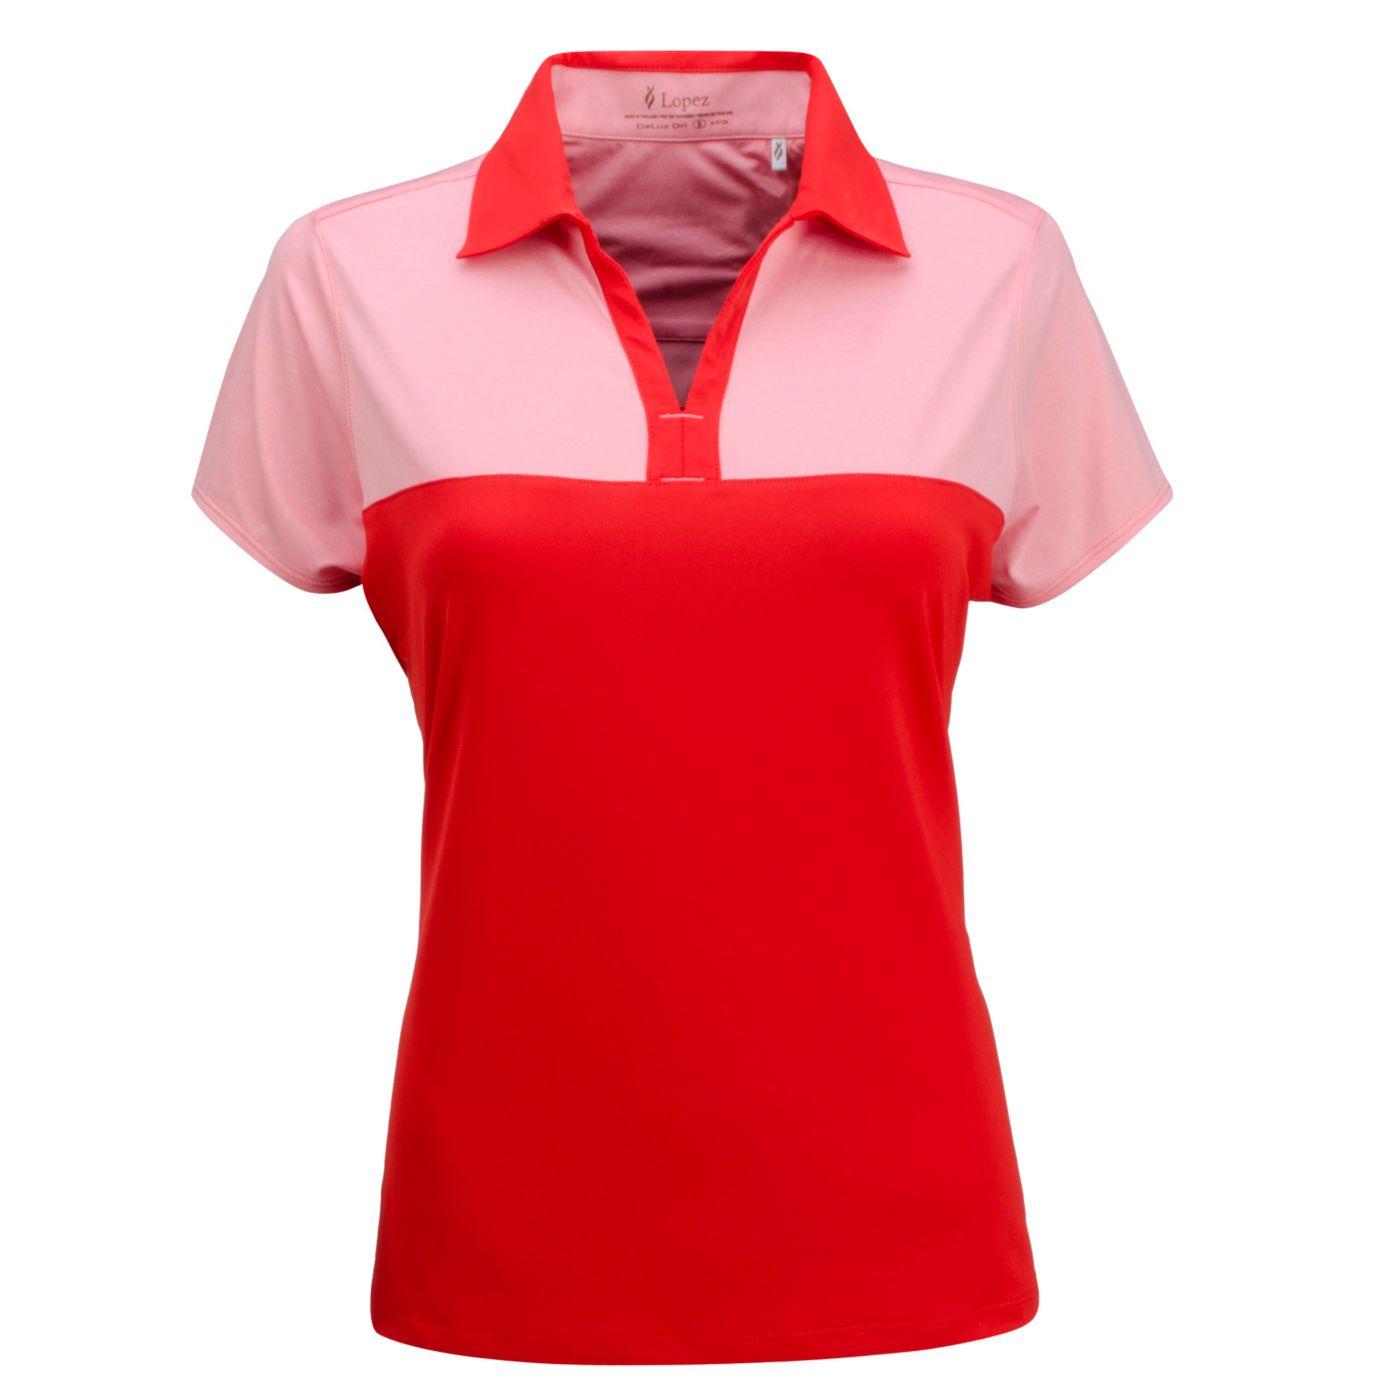 Nancy Lopez Women's Pursuit Short Sleeve Golf Polo - Extended Sizes